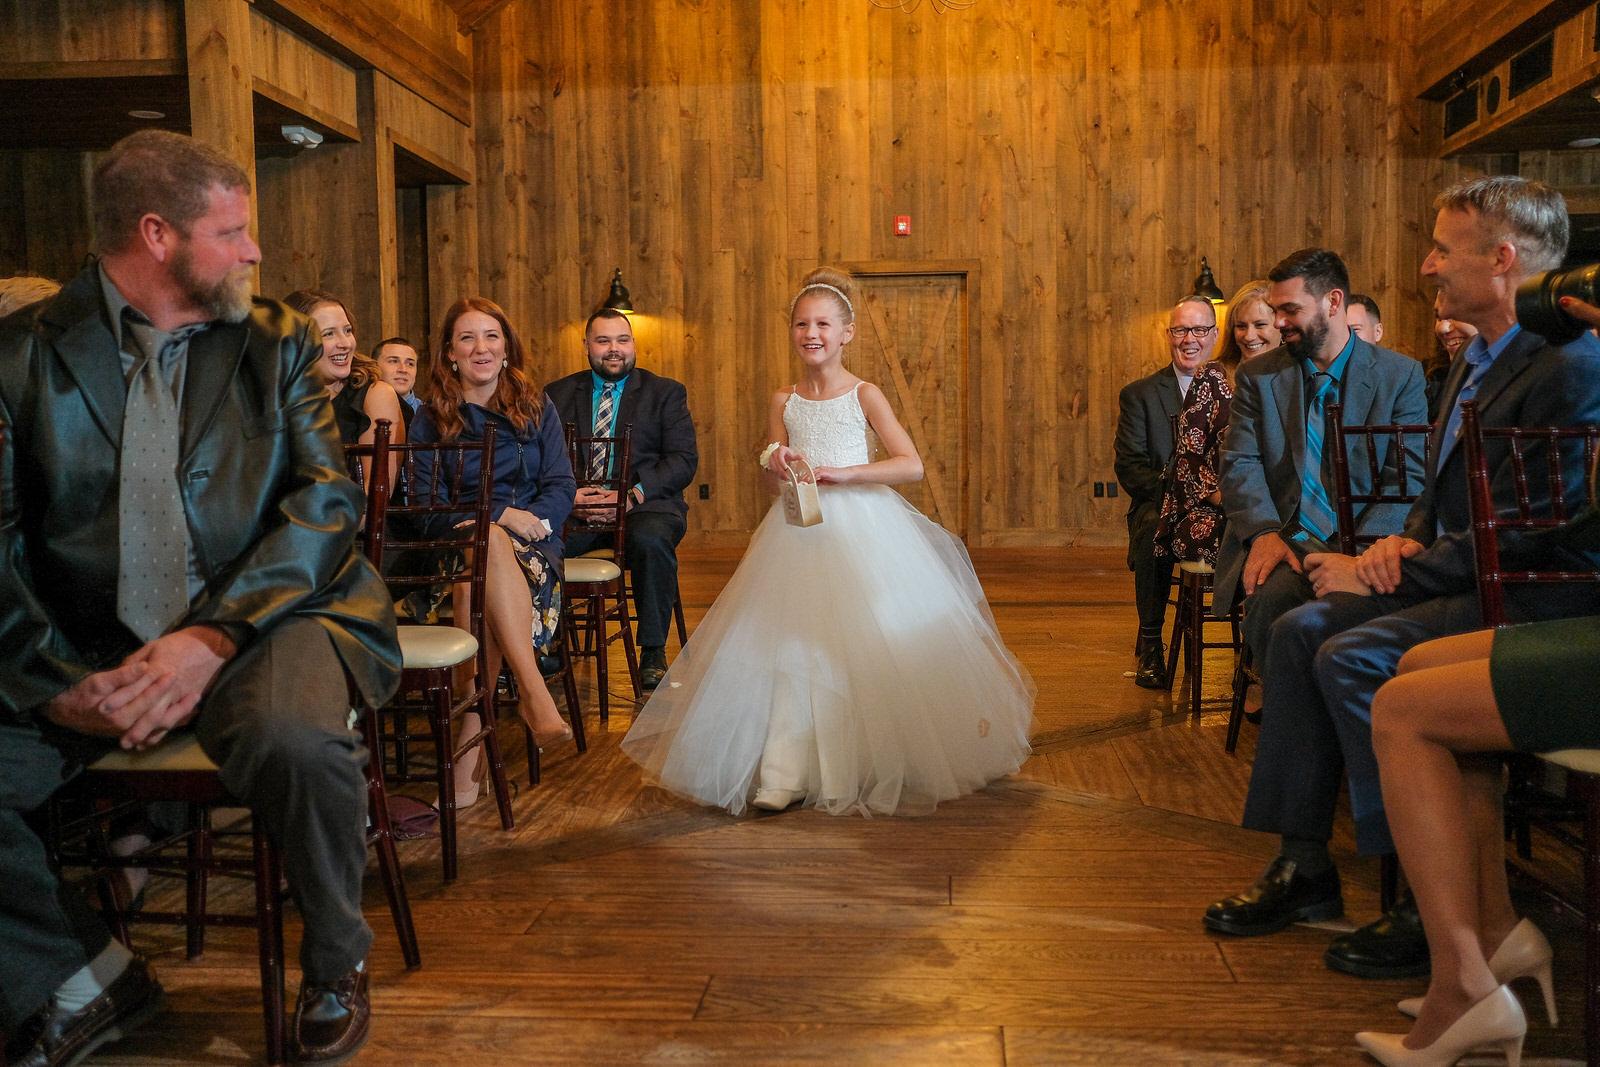 birch-wood-vineyards-wedding-photography-337.jpg